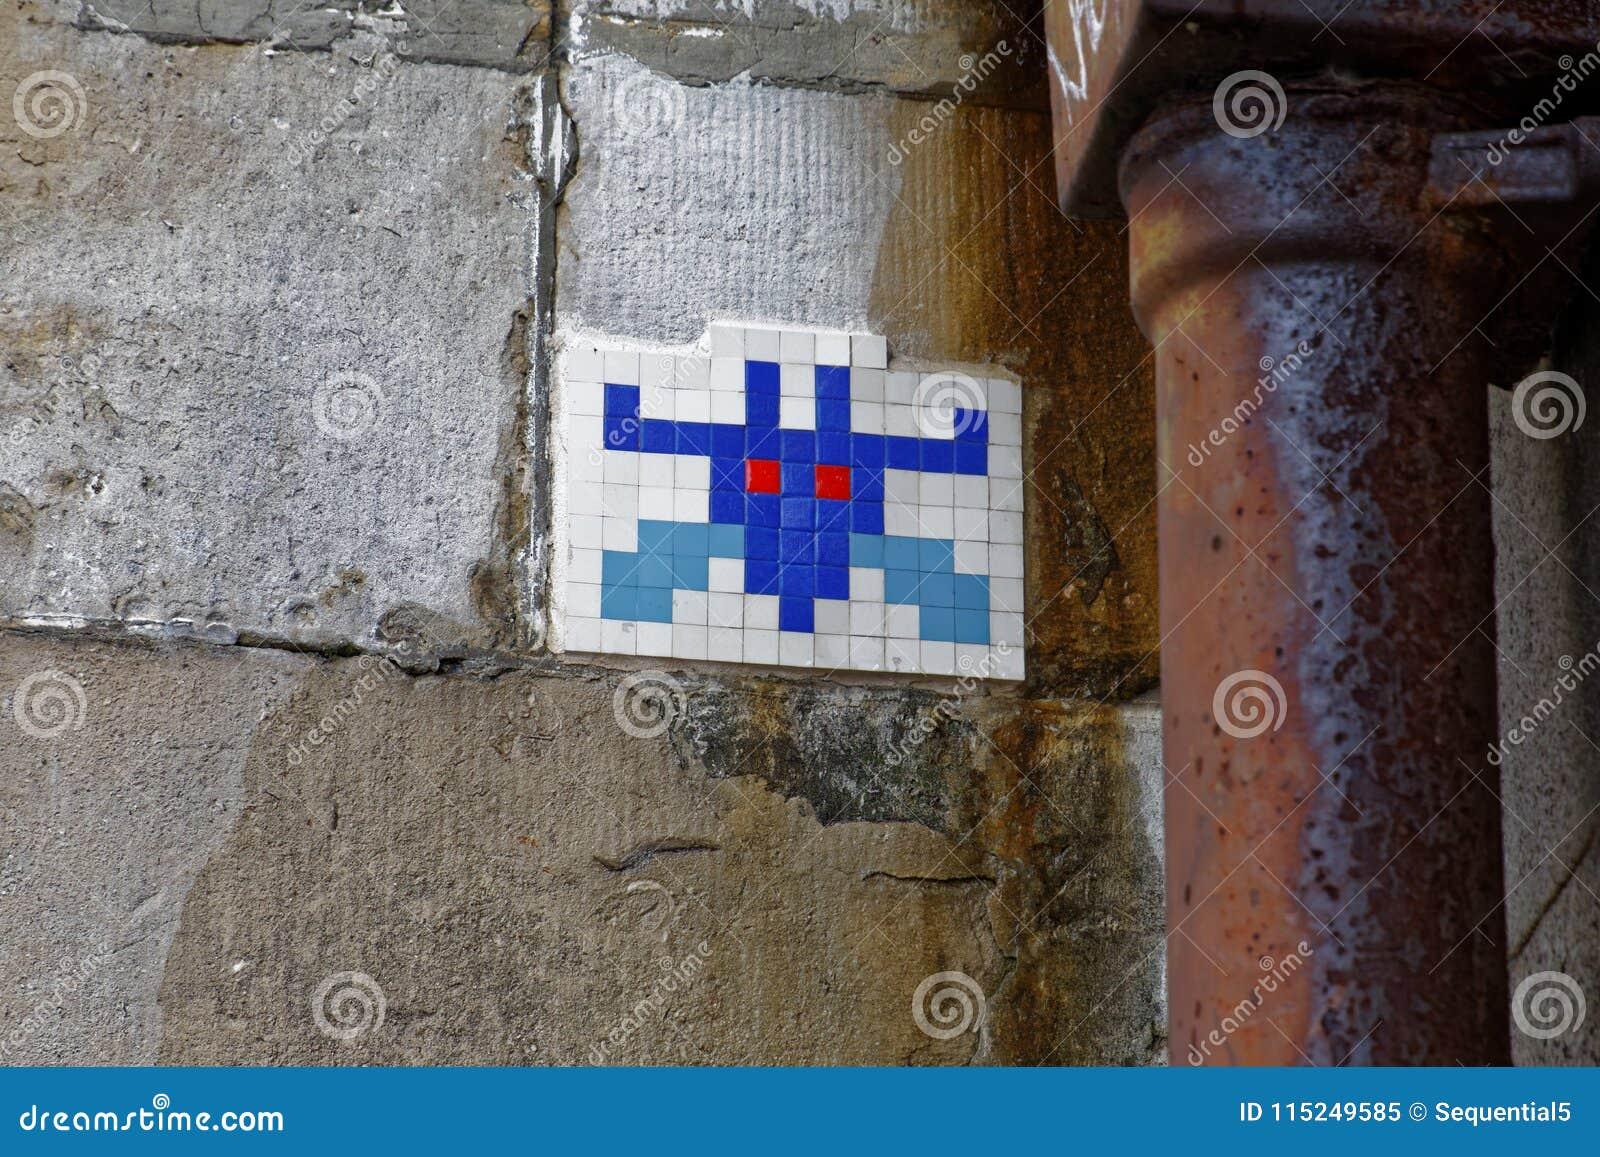 Pixel art on the Thames